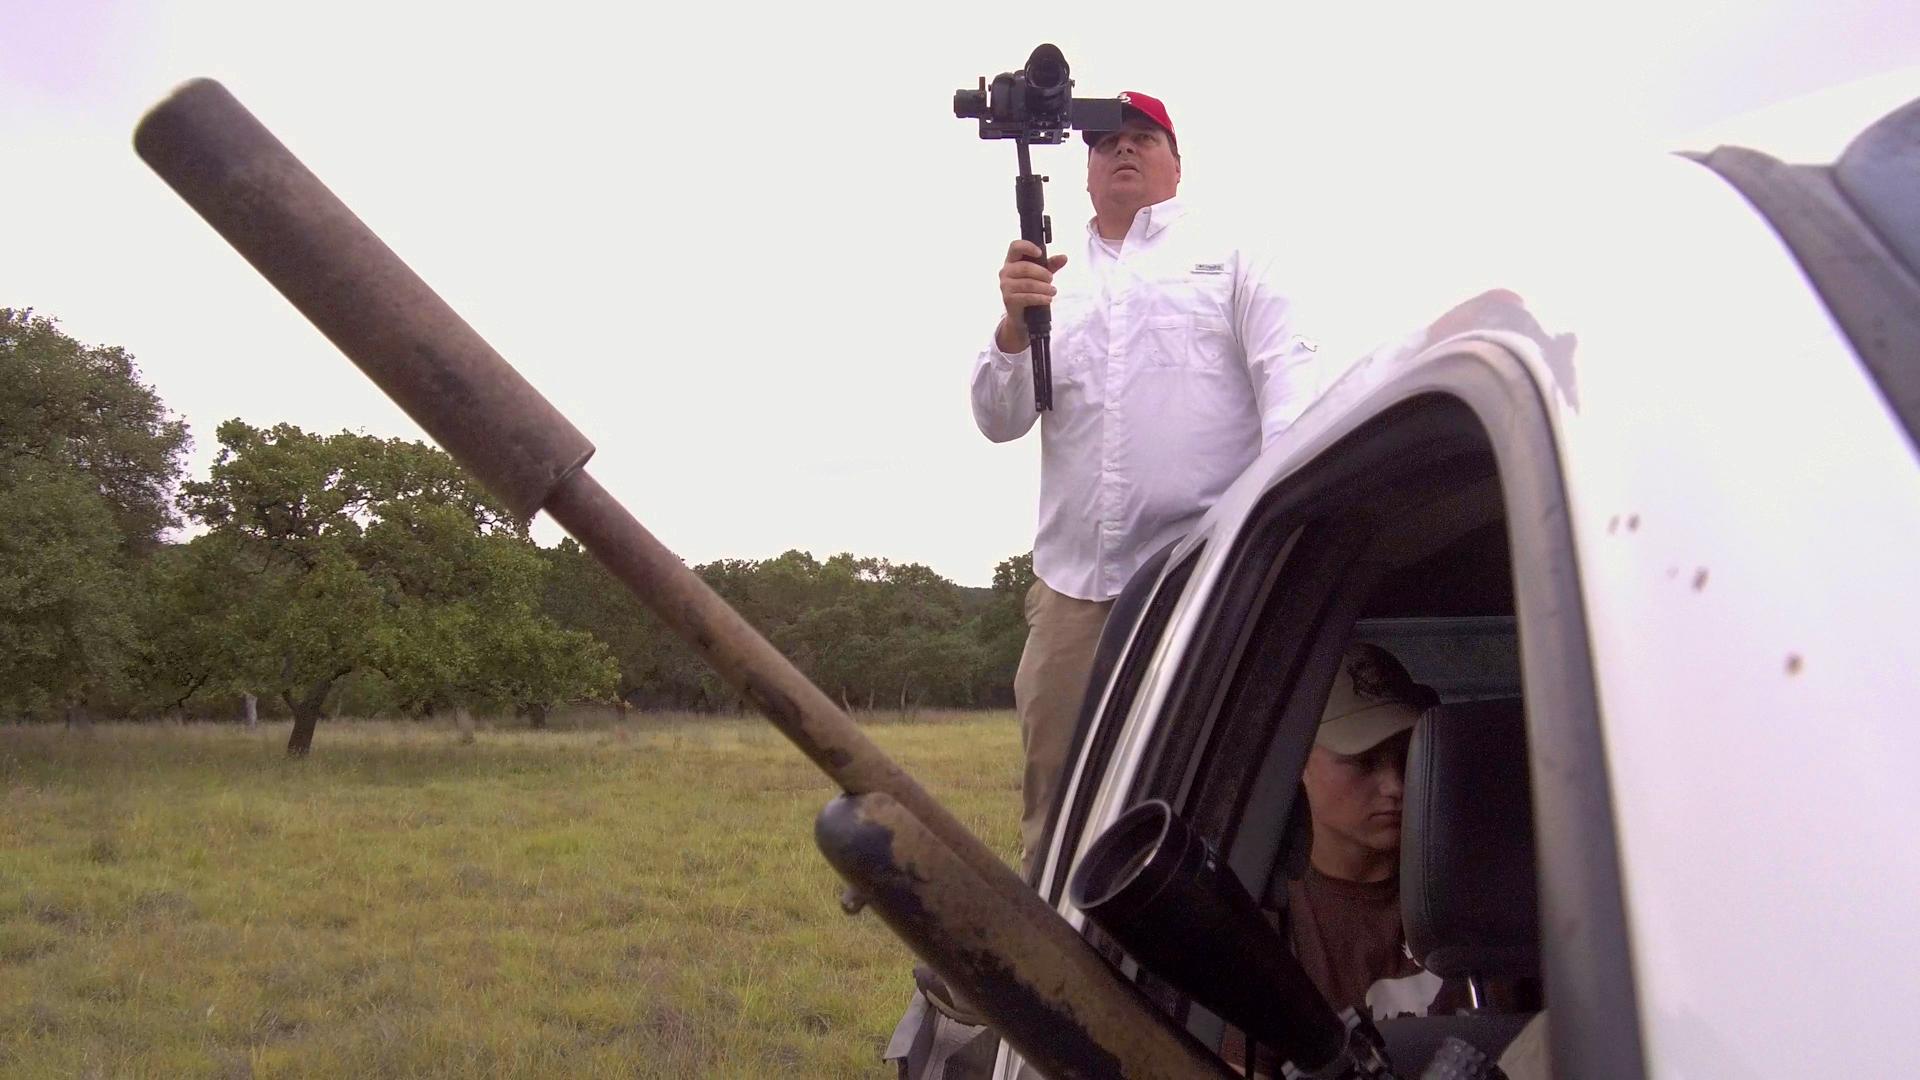 Scott-ShootingInTexas.jpg